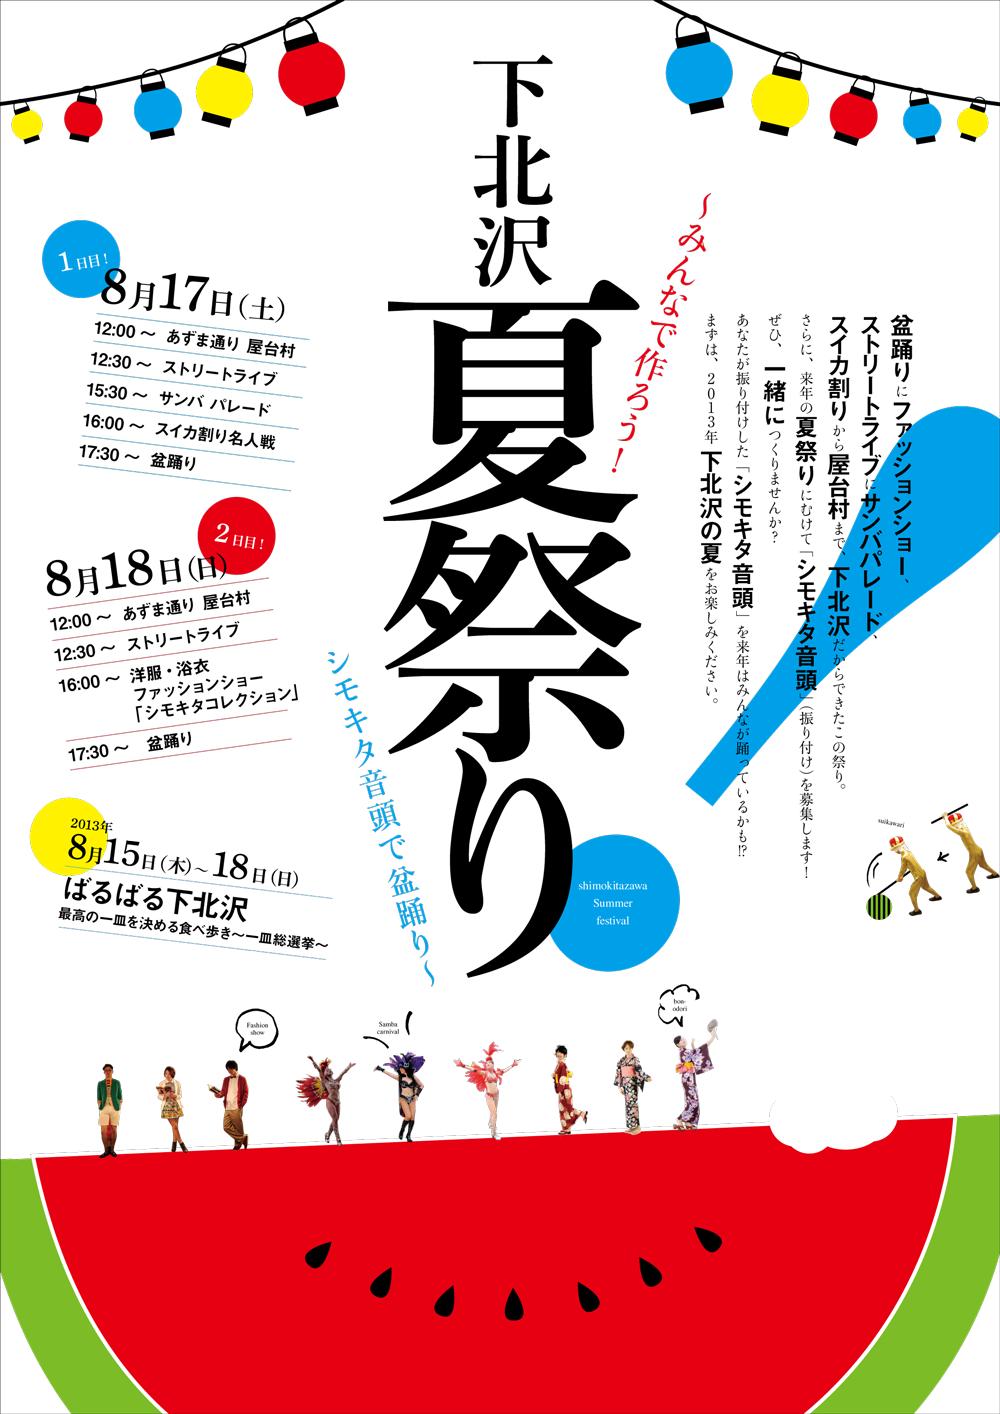 Pin By Yihsin Lai On Poster 夏祭り ポスター ポスターデザイン